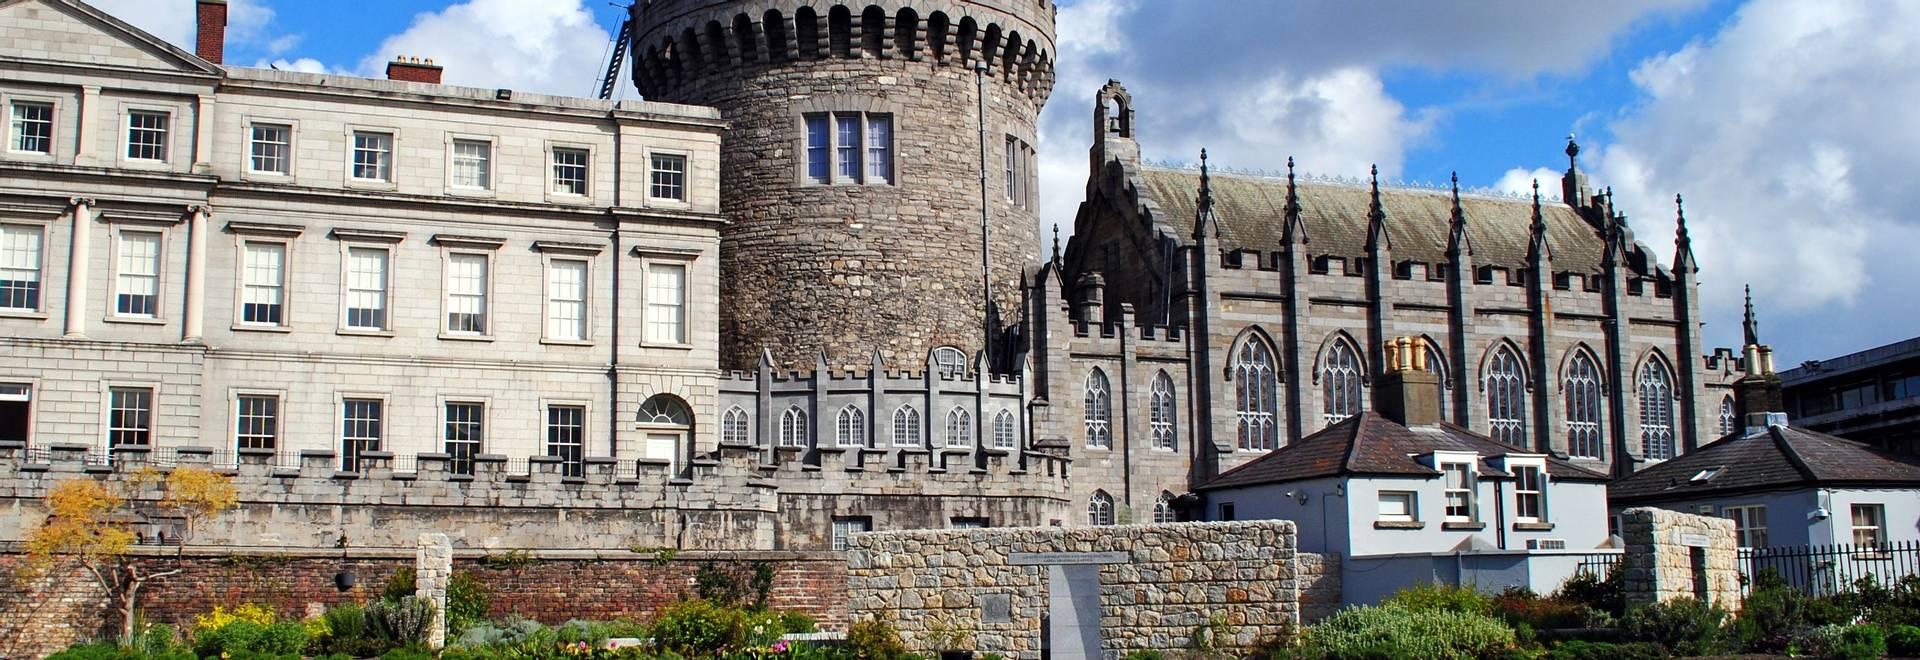 shutterstock_110432267 Dublin Castle.jpg